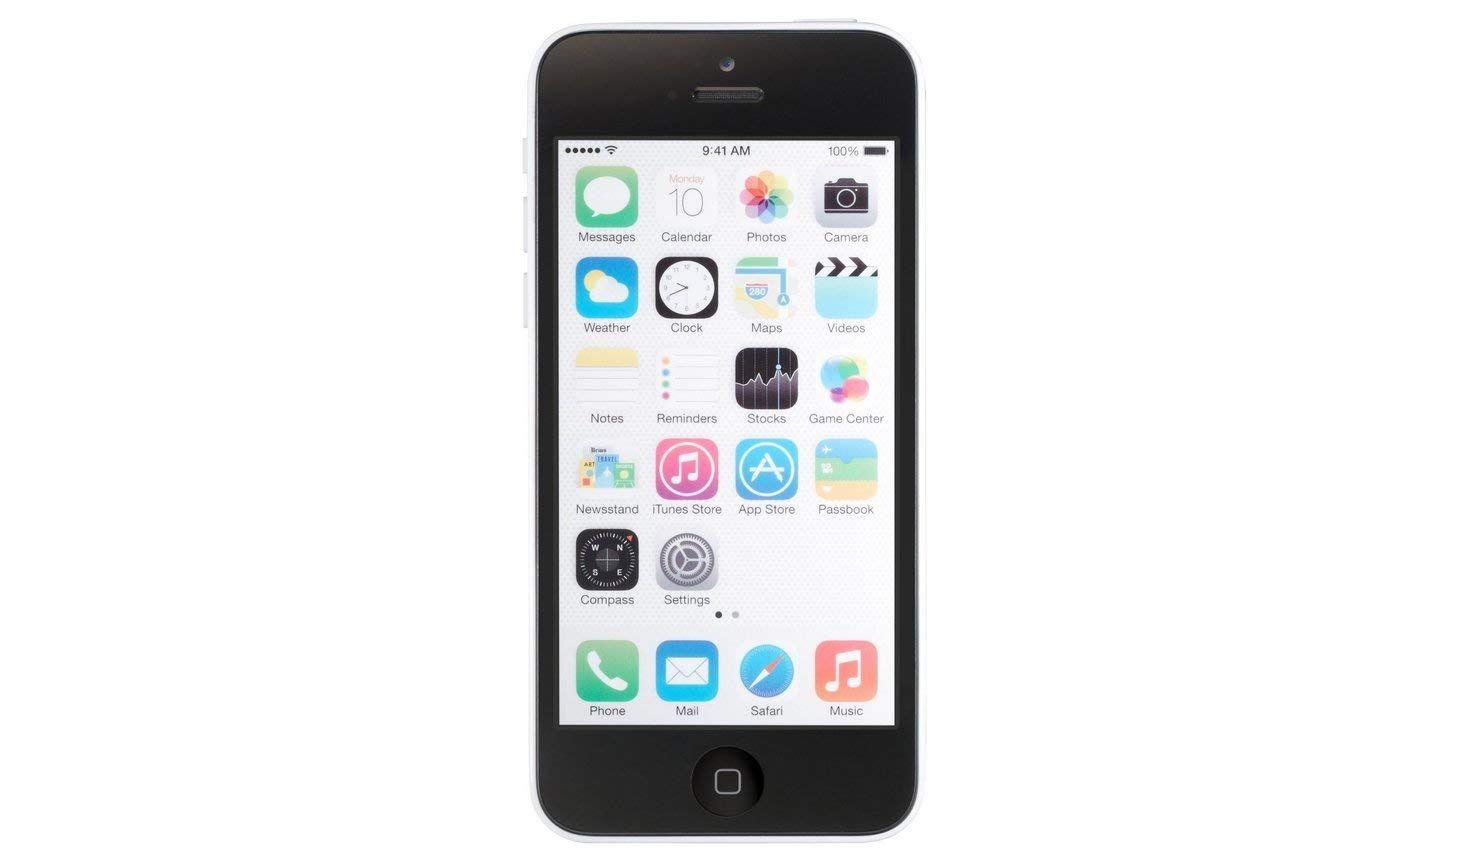 Apple iphone 5c factory unlocked cellphone 8gb white price